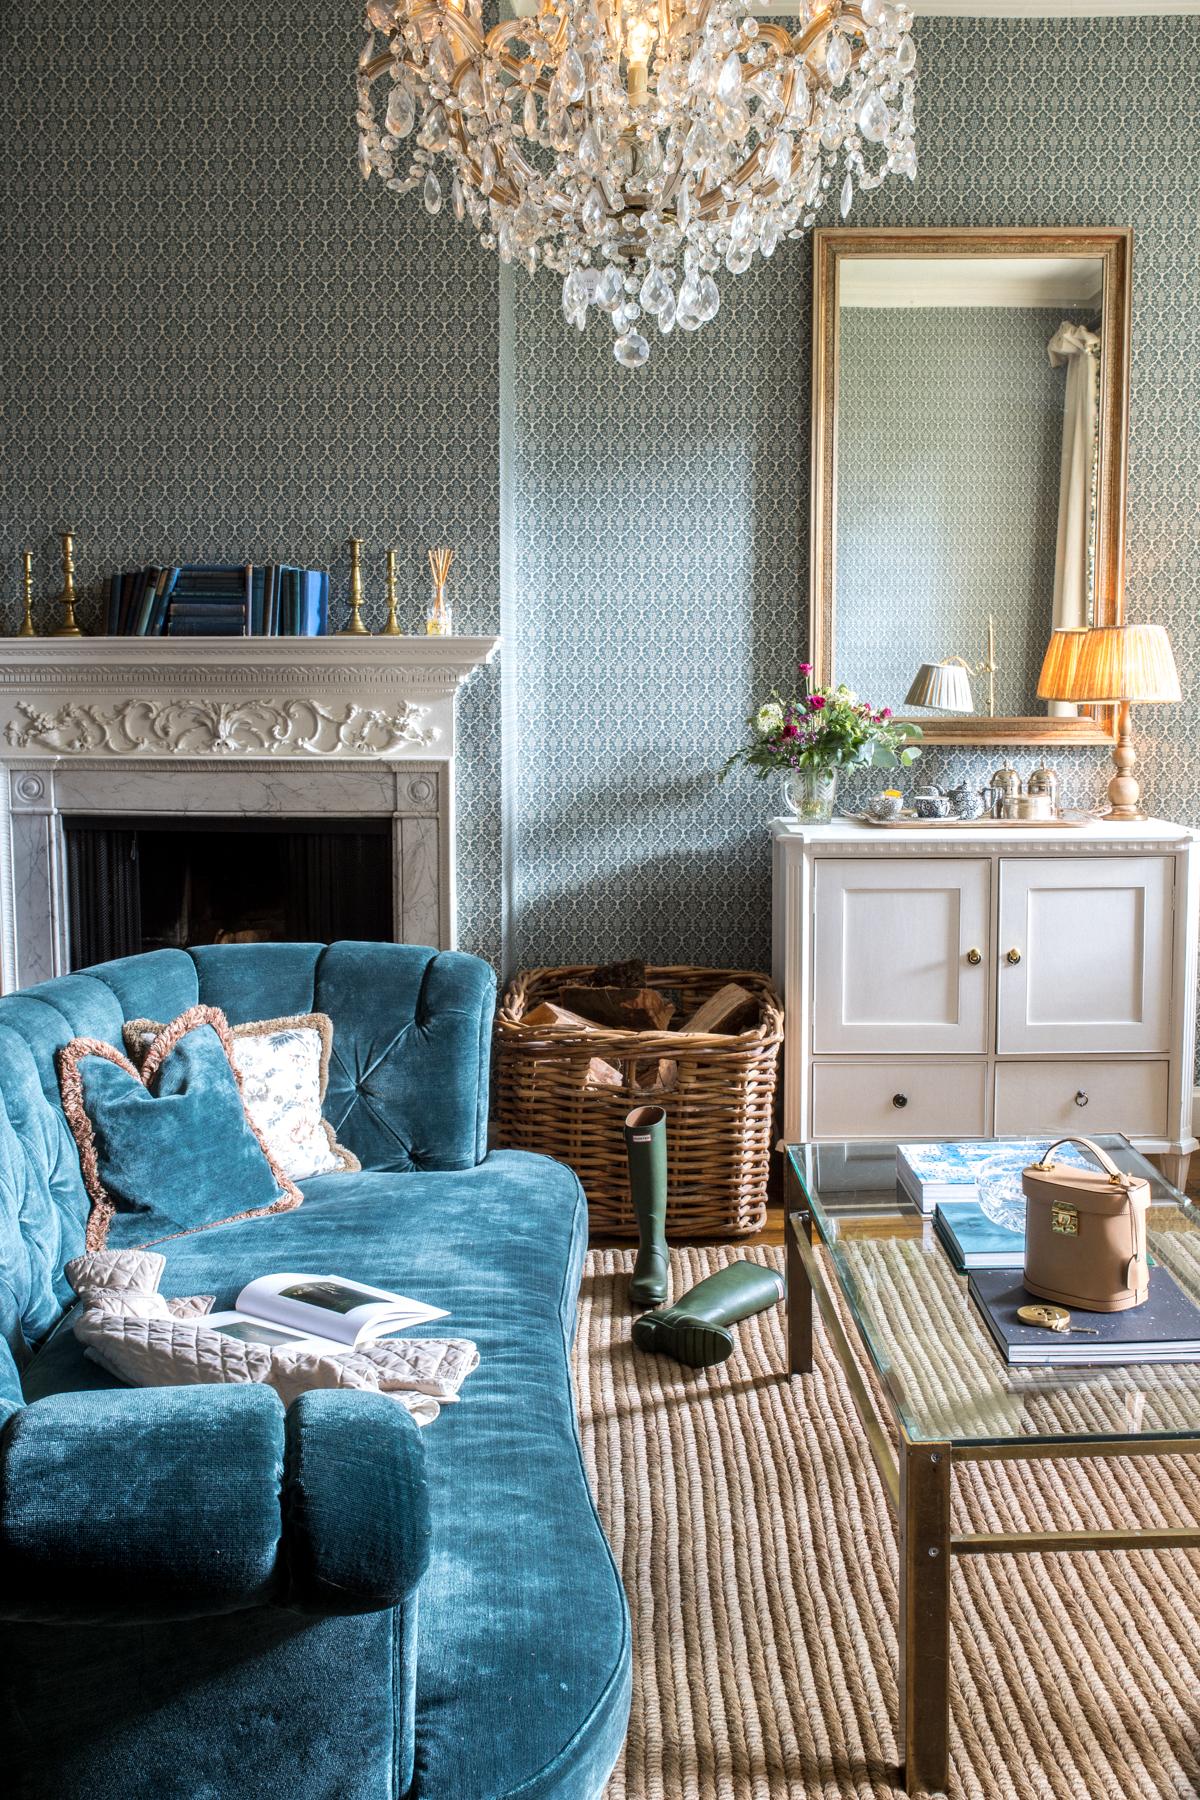 Stacie Flinner Soho House Babington House England-6.jpg